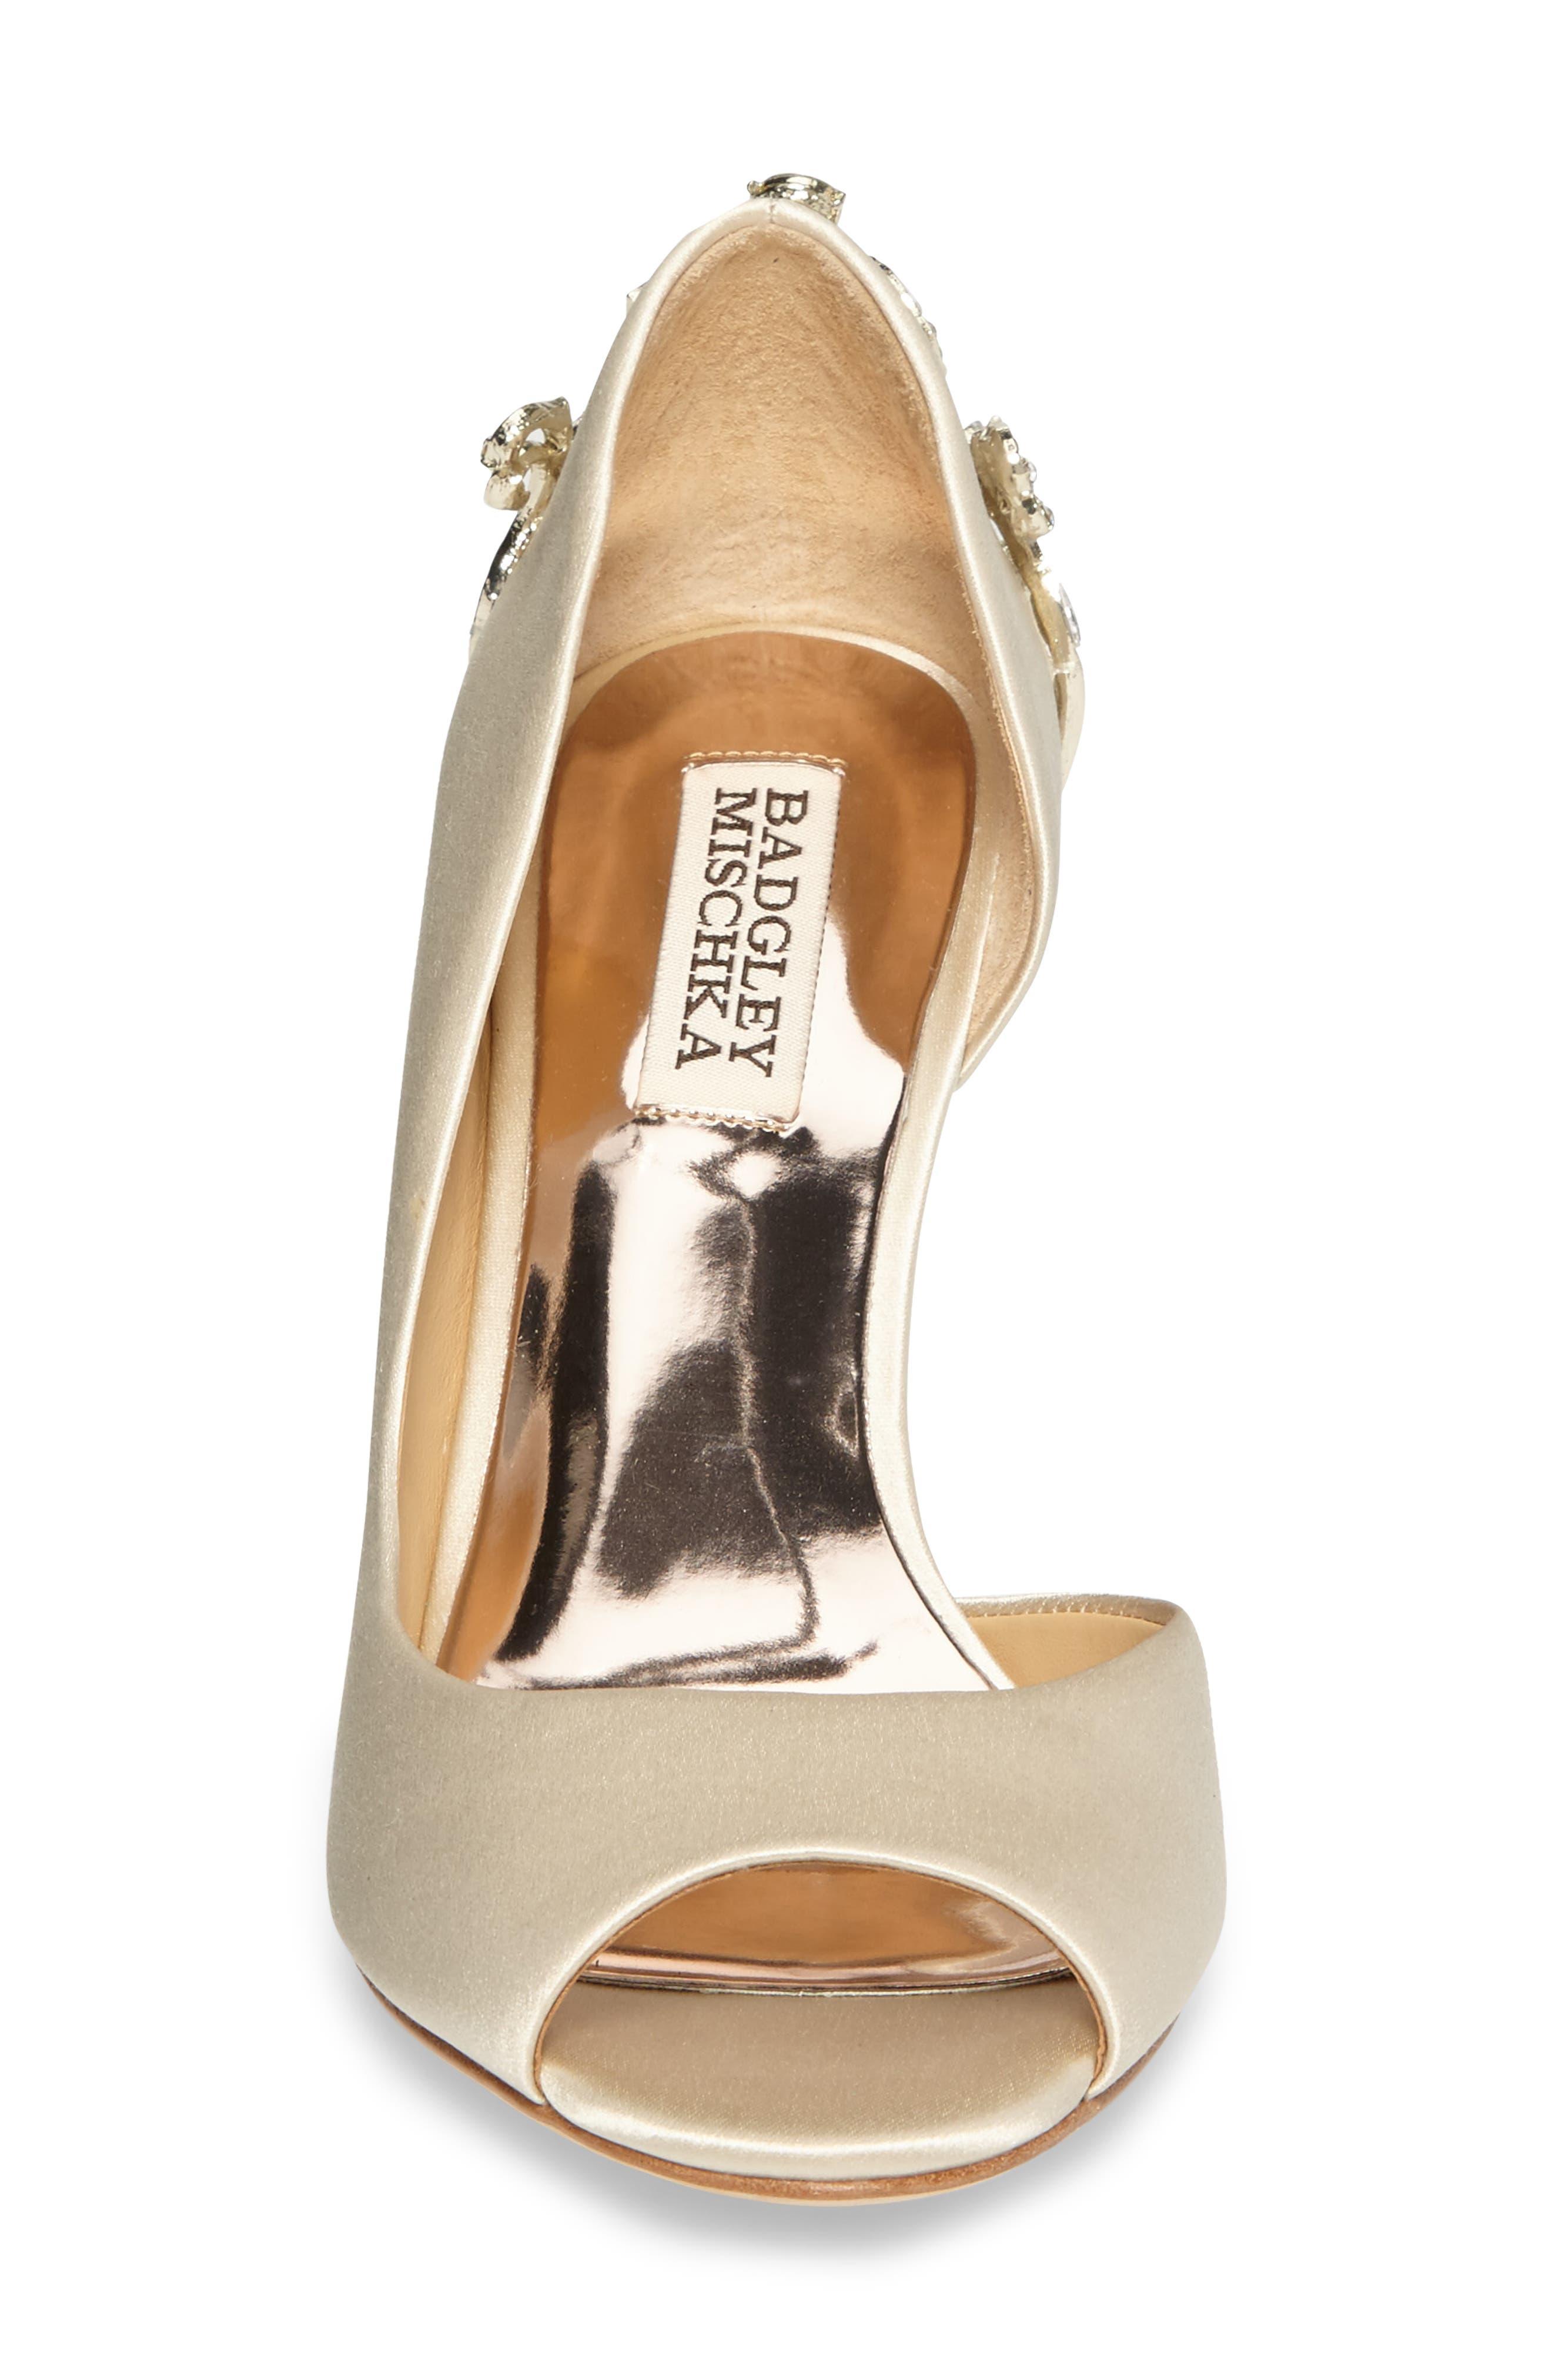 Meagan Embellished Peep Toe Wedge,                             Alternate thumbnail 4, color,                             Ivory Satin